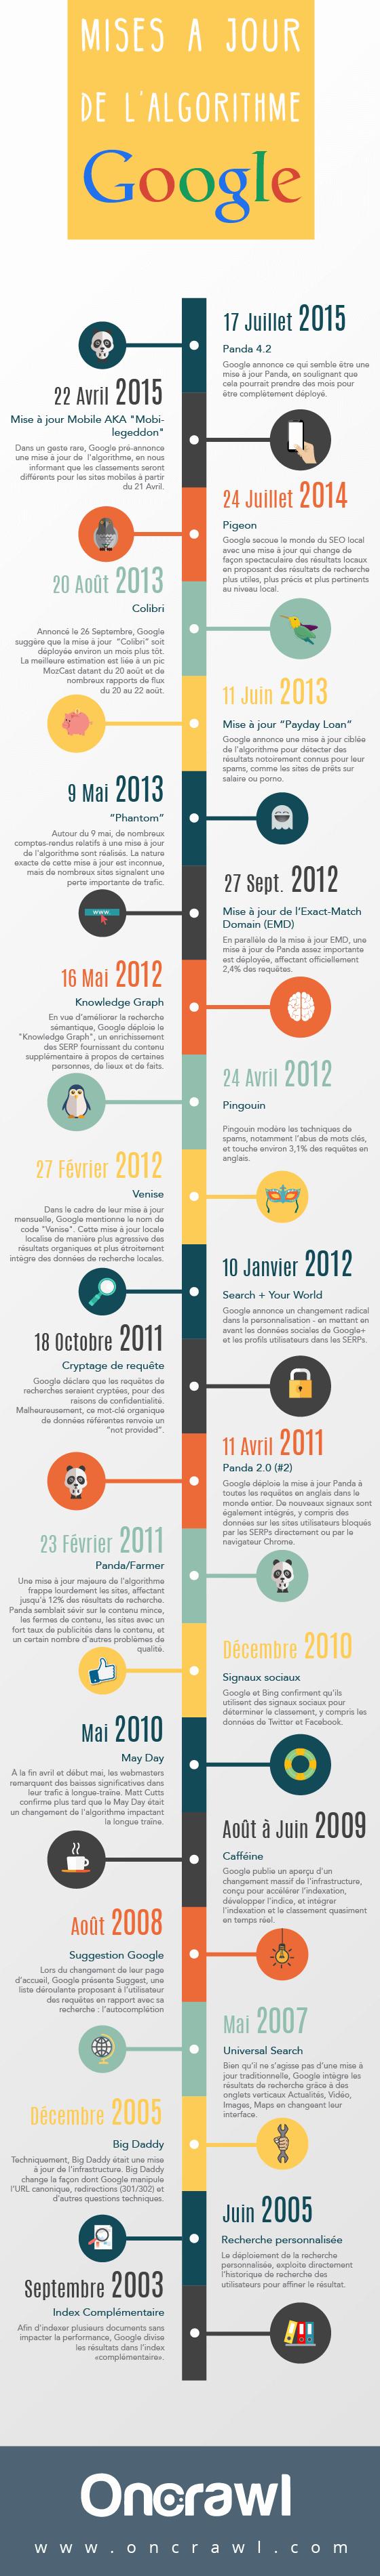 infographie-google-updates-FR-01